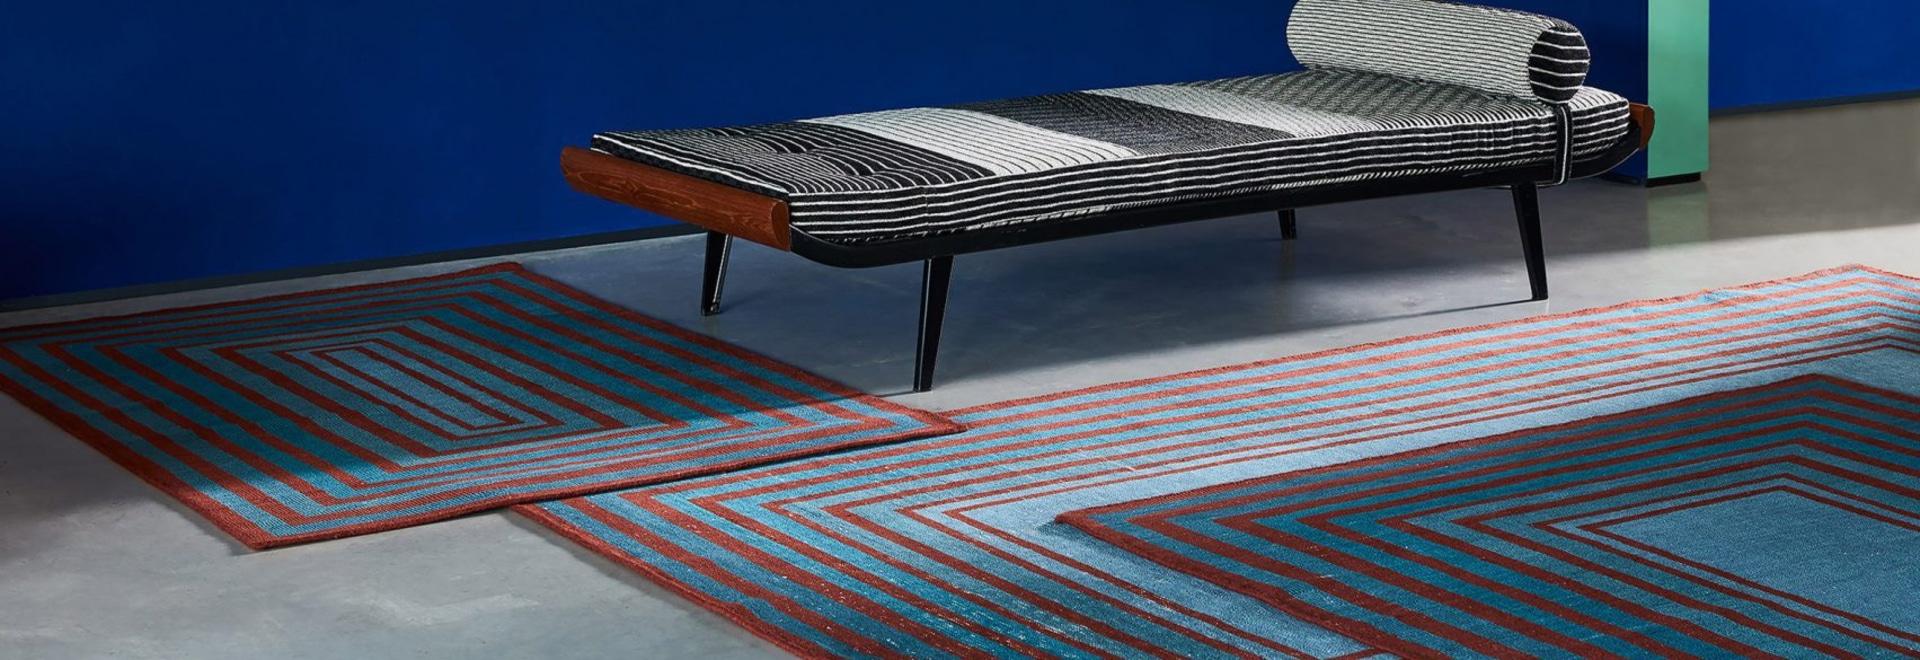 "Las alfombras modulares de Sebastian Wrong pueden ser conectadas en un ""campo sin fin"""